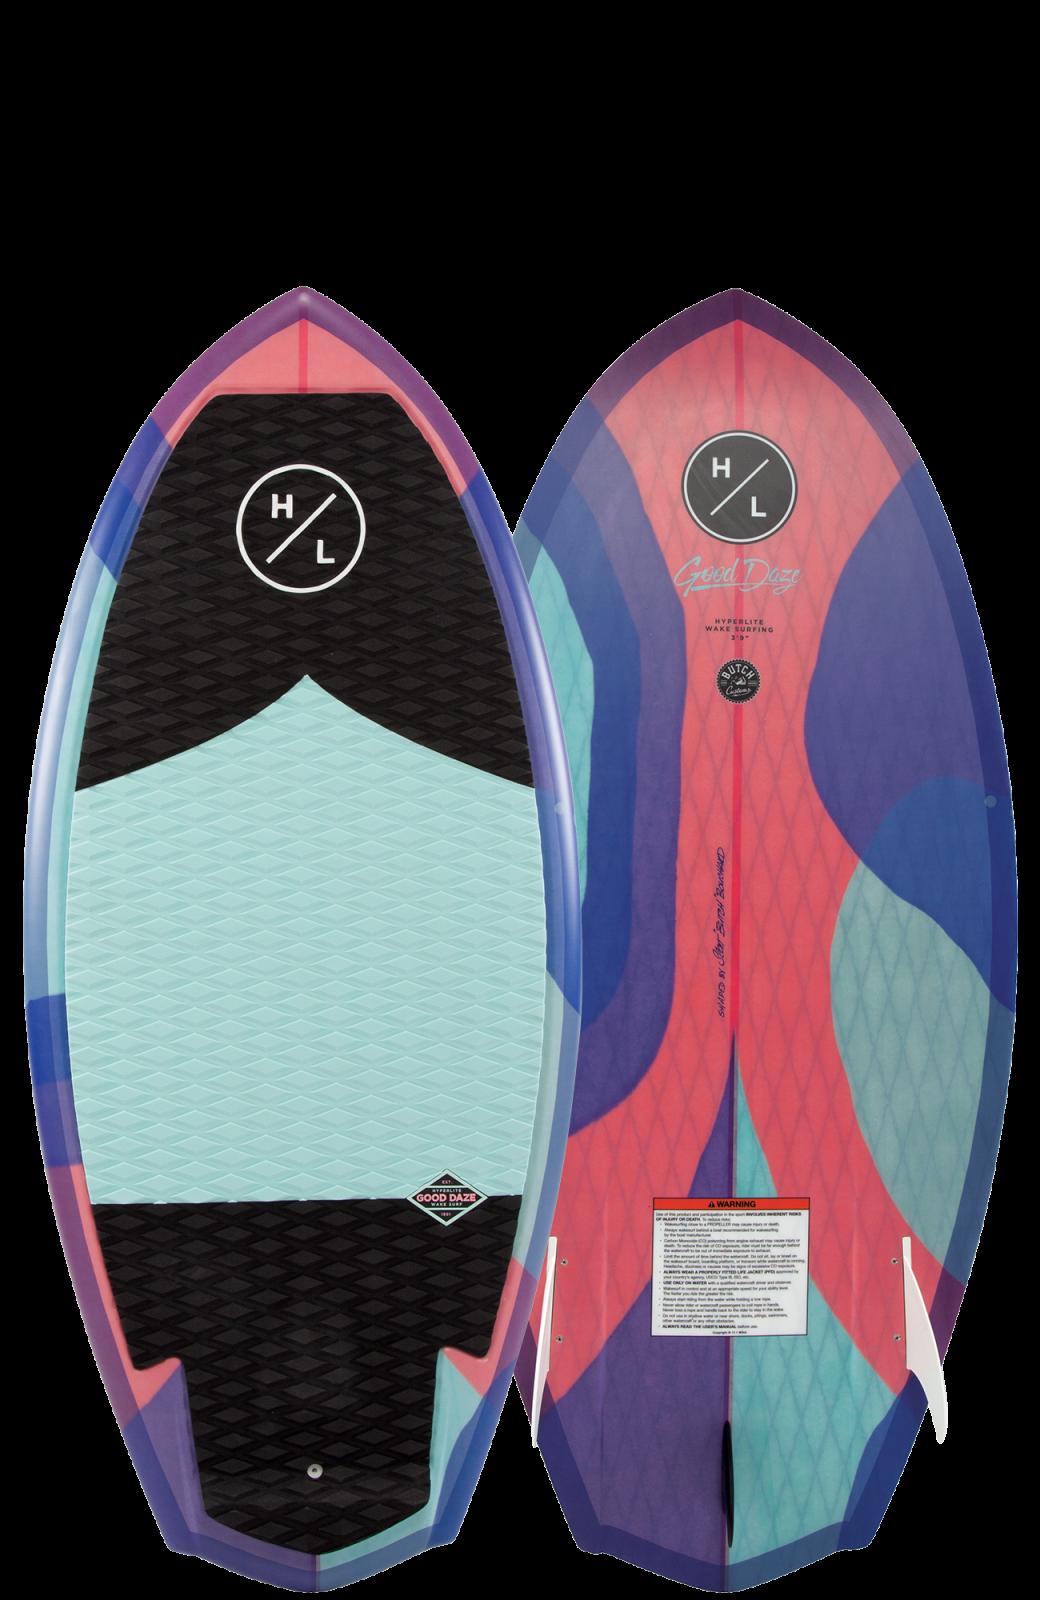 2019 Hyperlite Good Daze Wakesurf Board